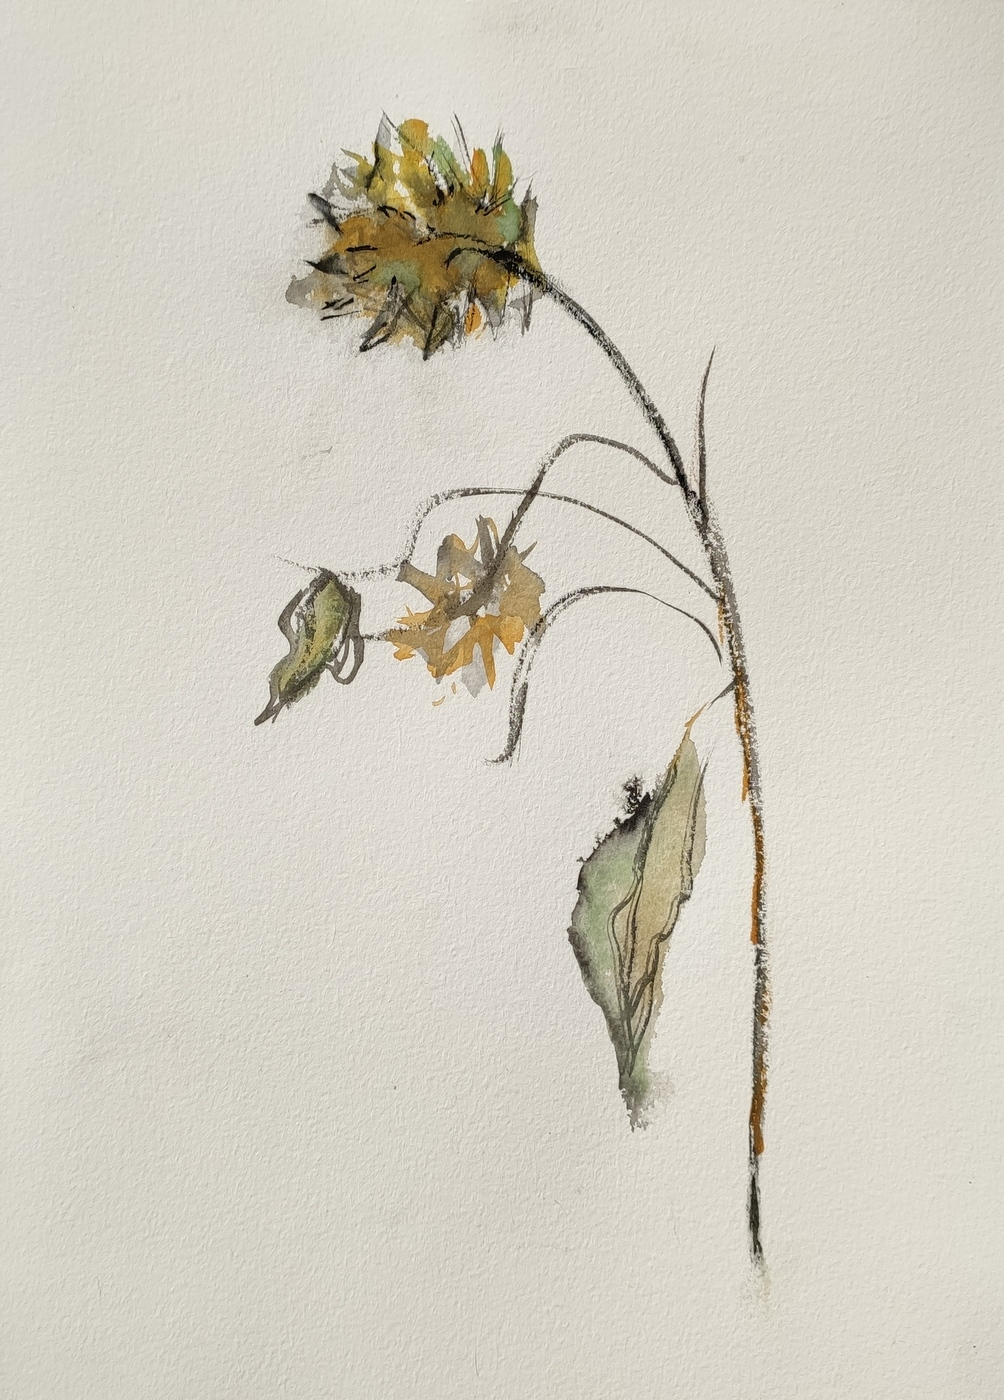 Sonnenblume_Herbst_Aquarell